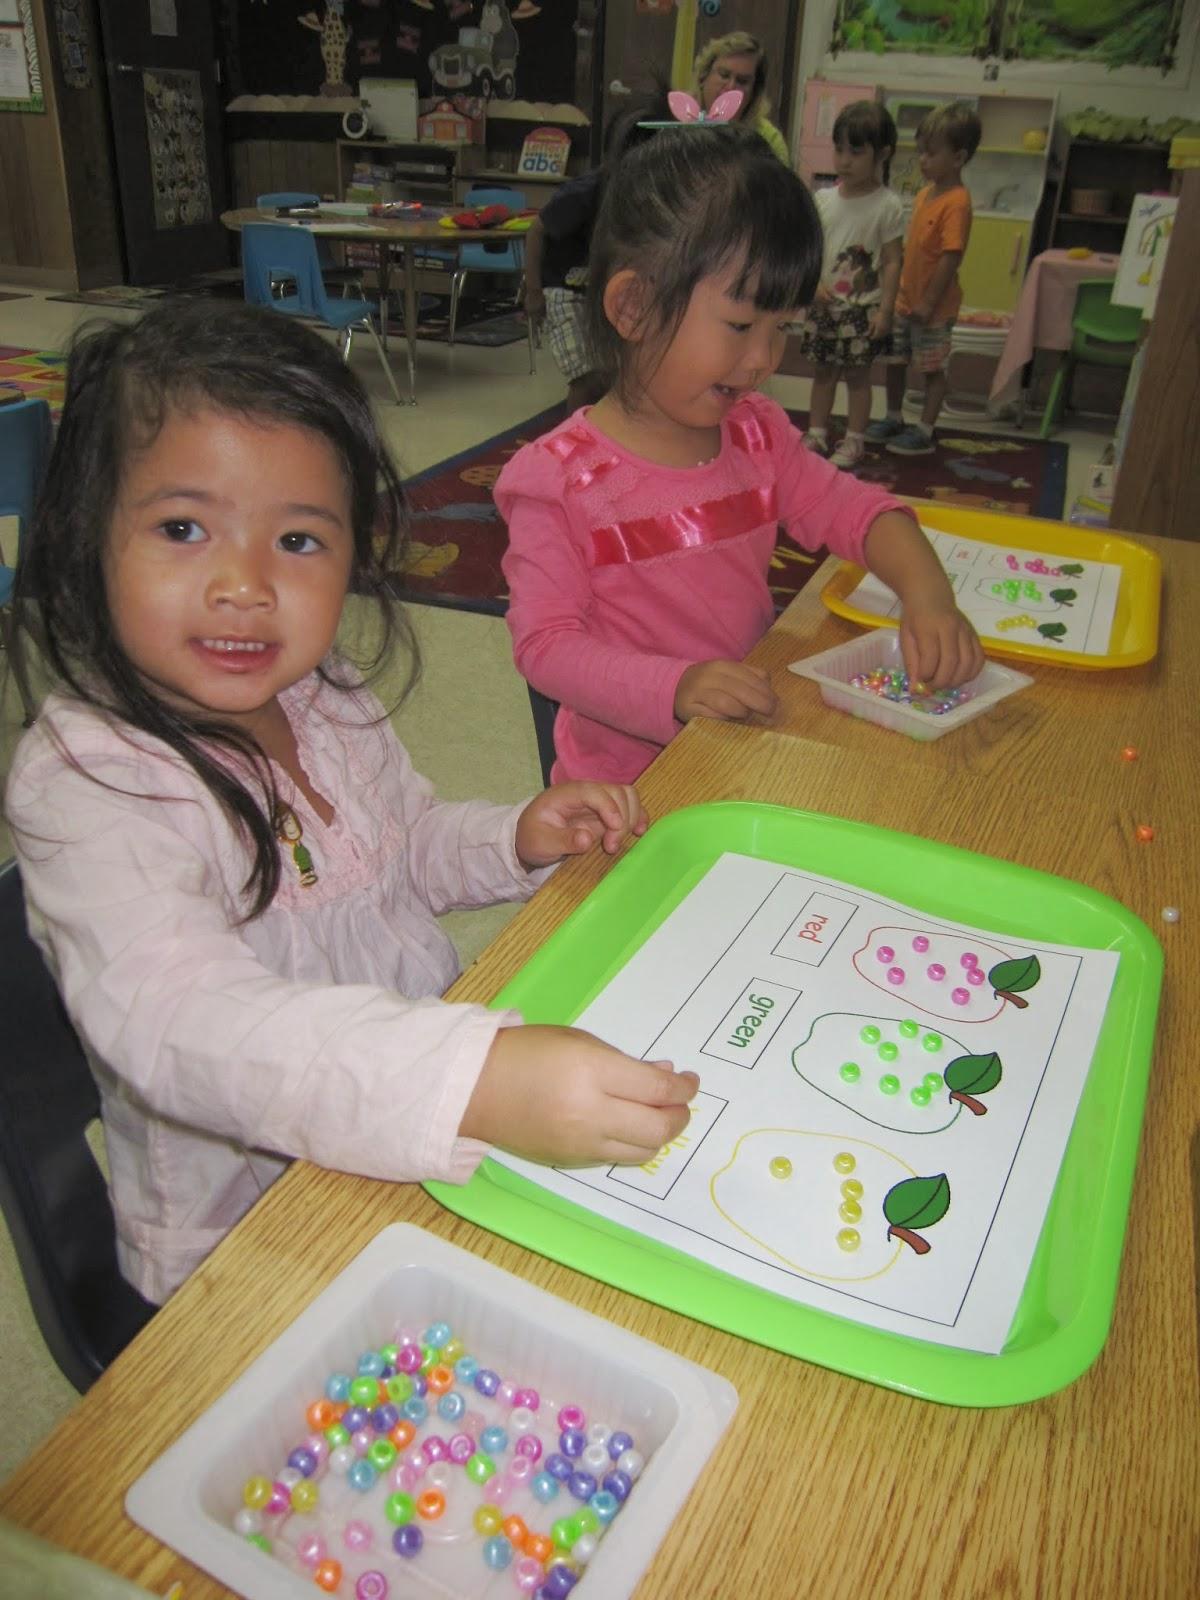 Preschool For Rookies Apple Solutely Fun